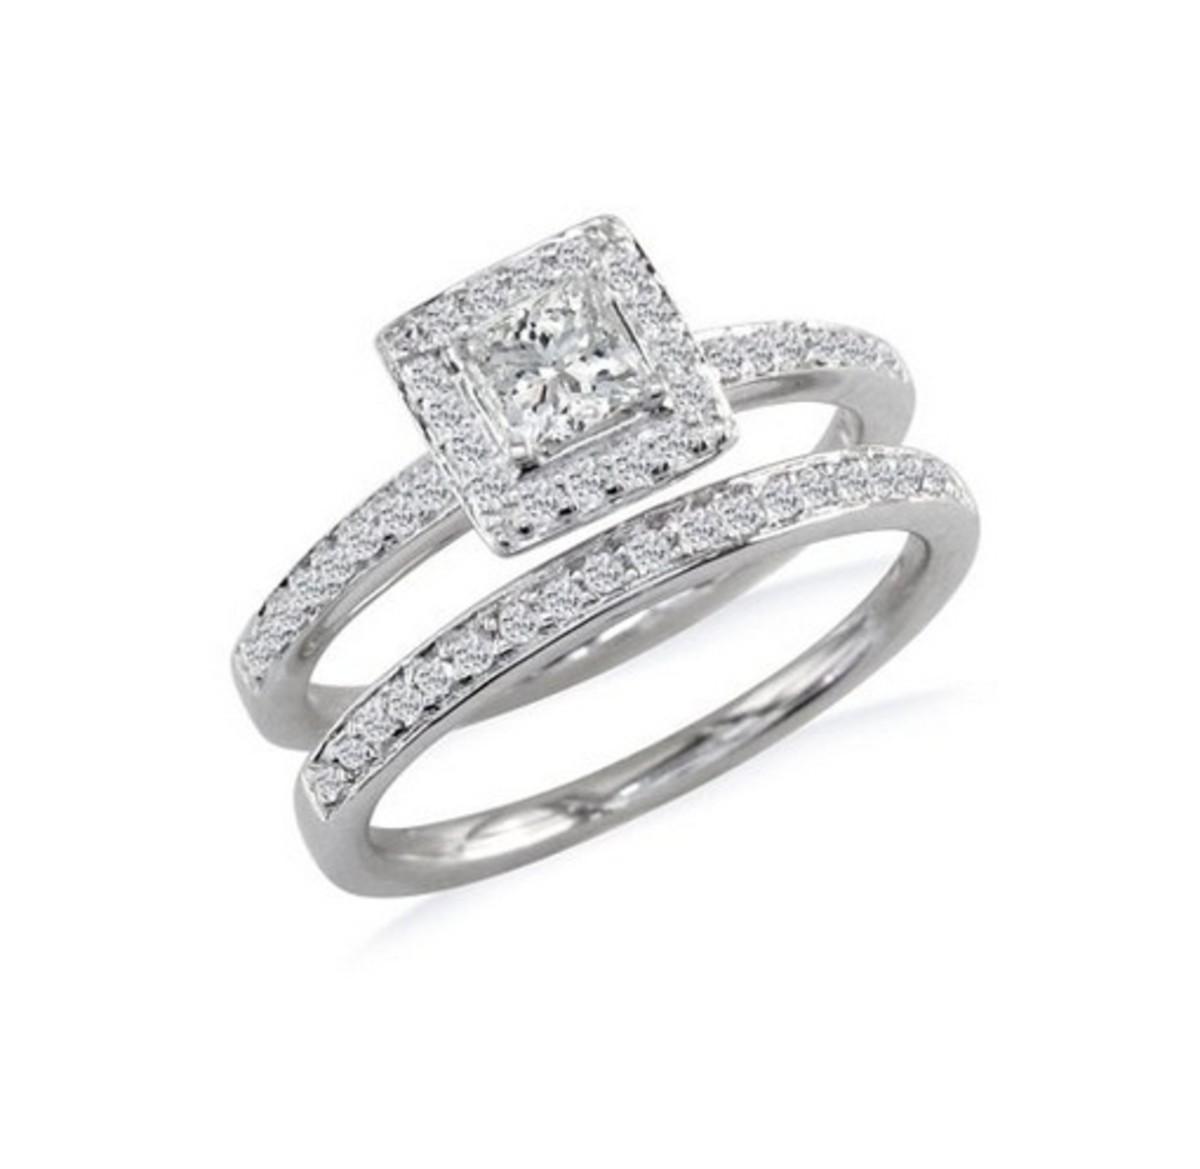 Princess Cut Diamond Bridal Ring Set